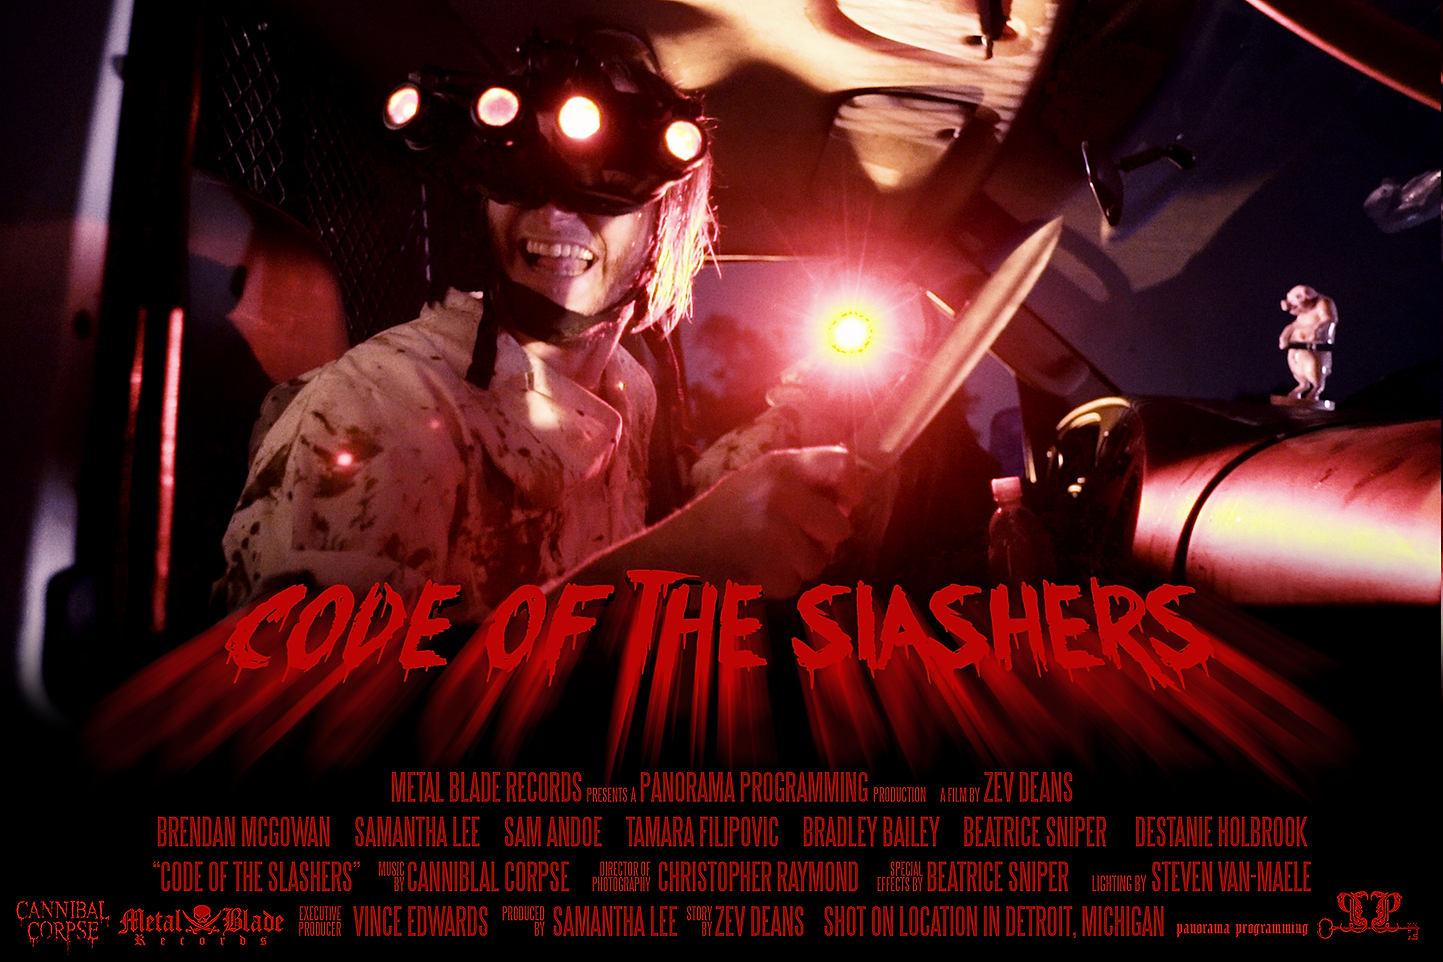 Code of the Slashers